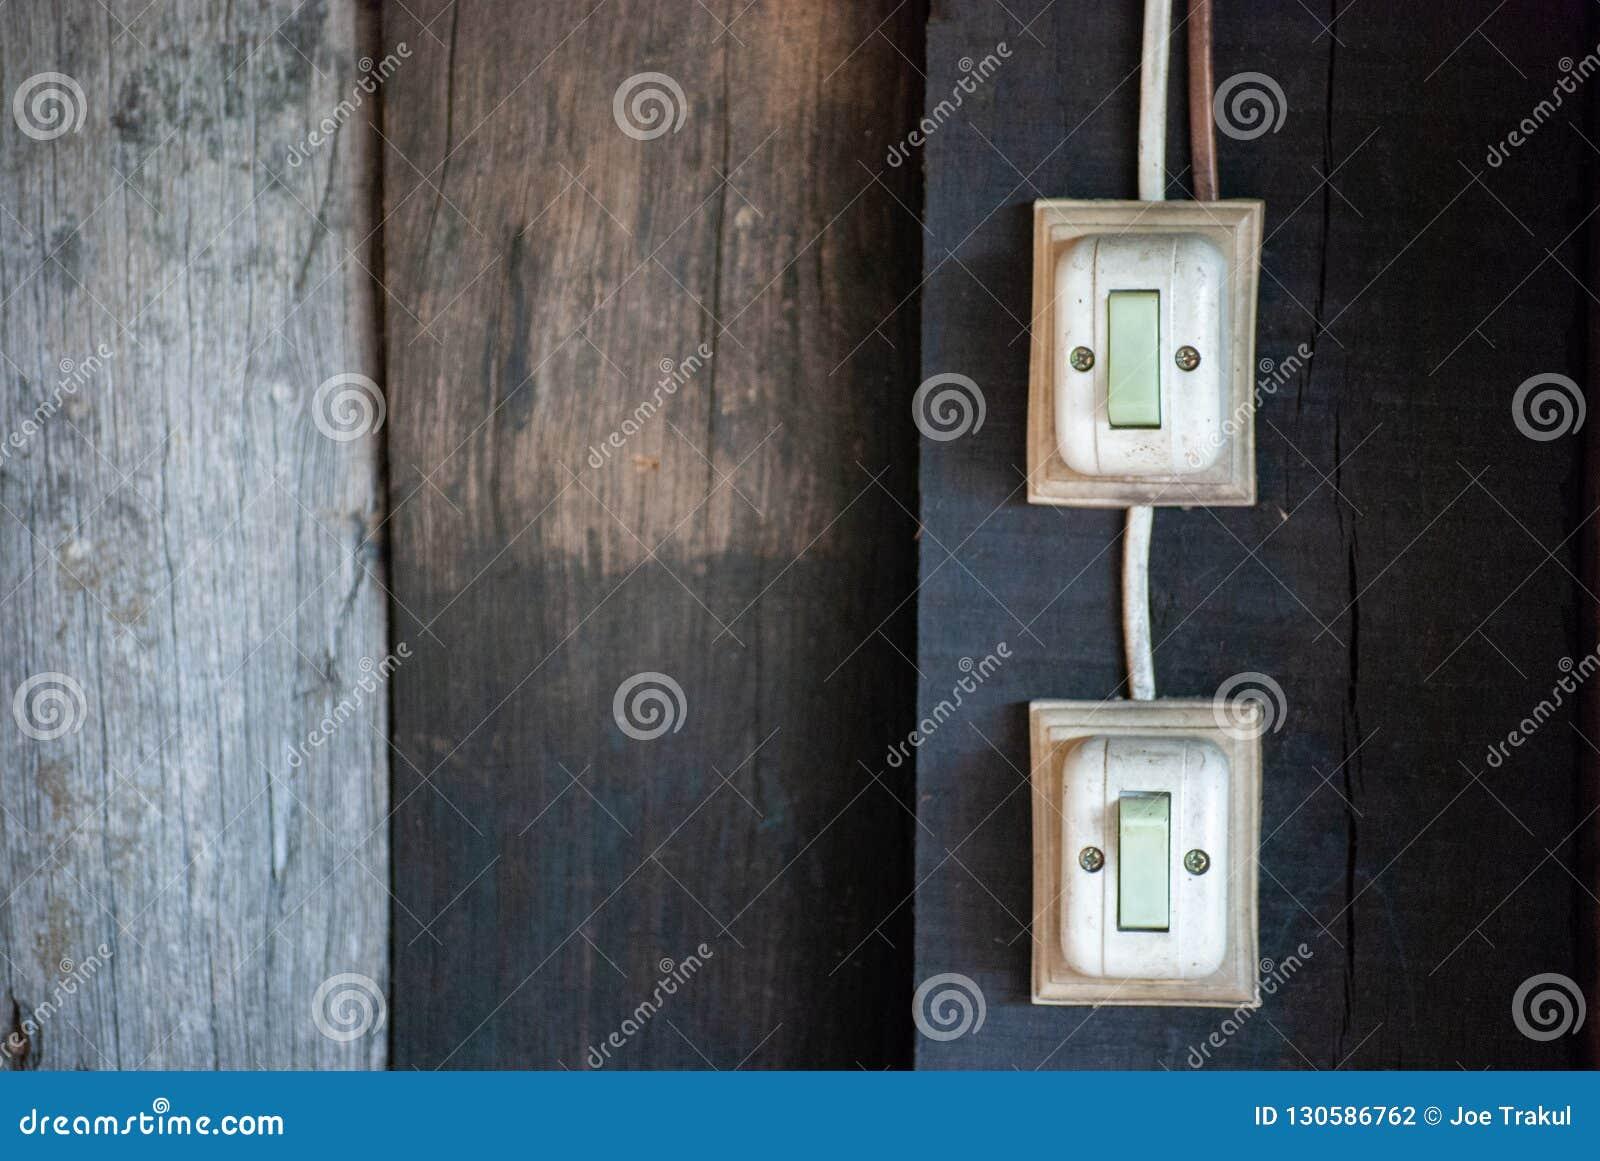 Interruptor velho na parede